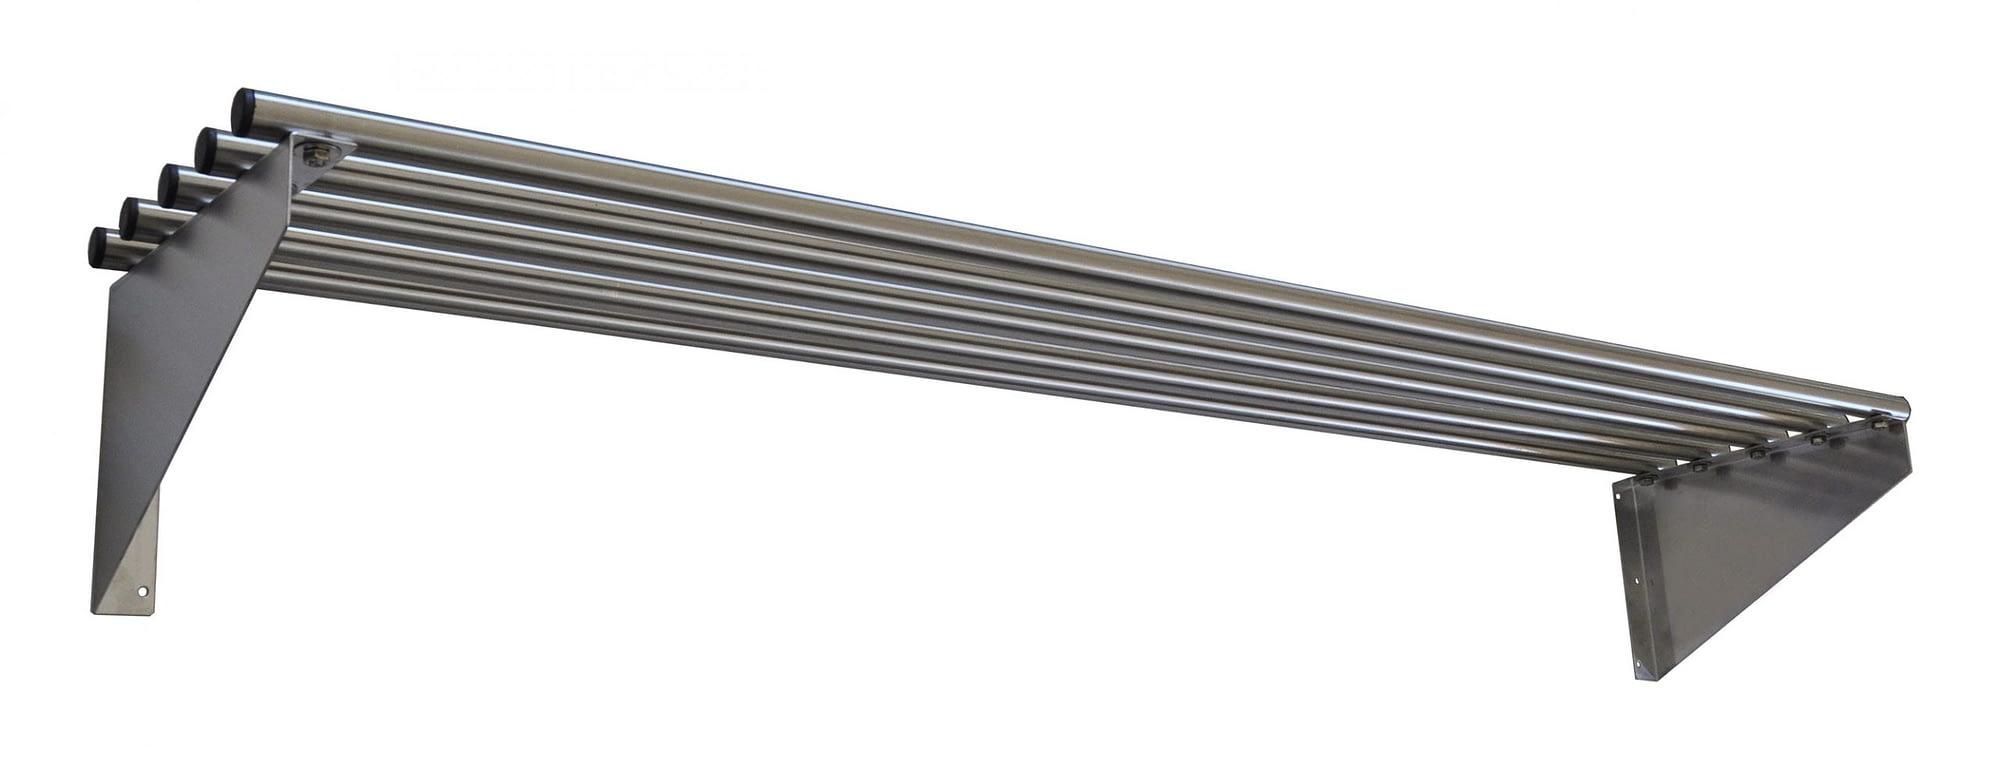 Stainless Steel Restaurant Pipe Wall Shelves, 1500 X 300mm deep-0